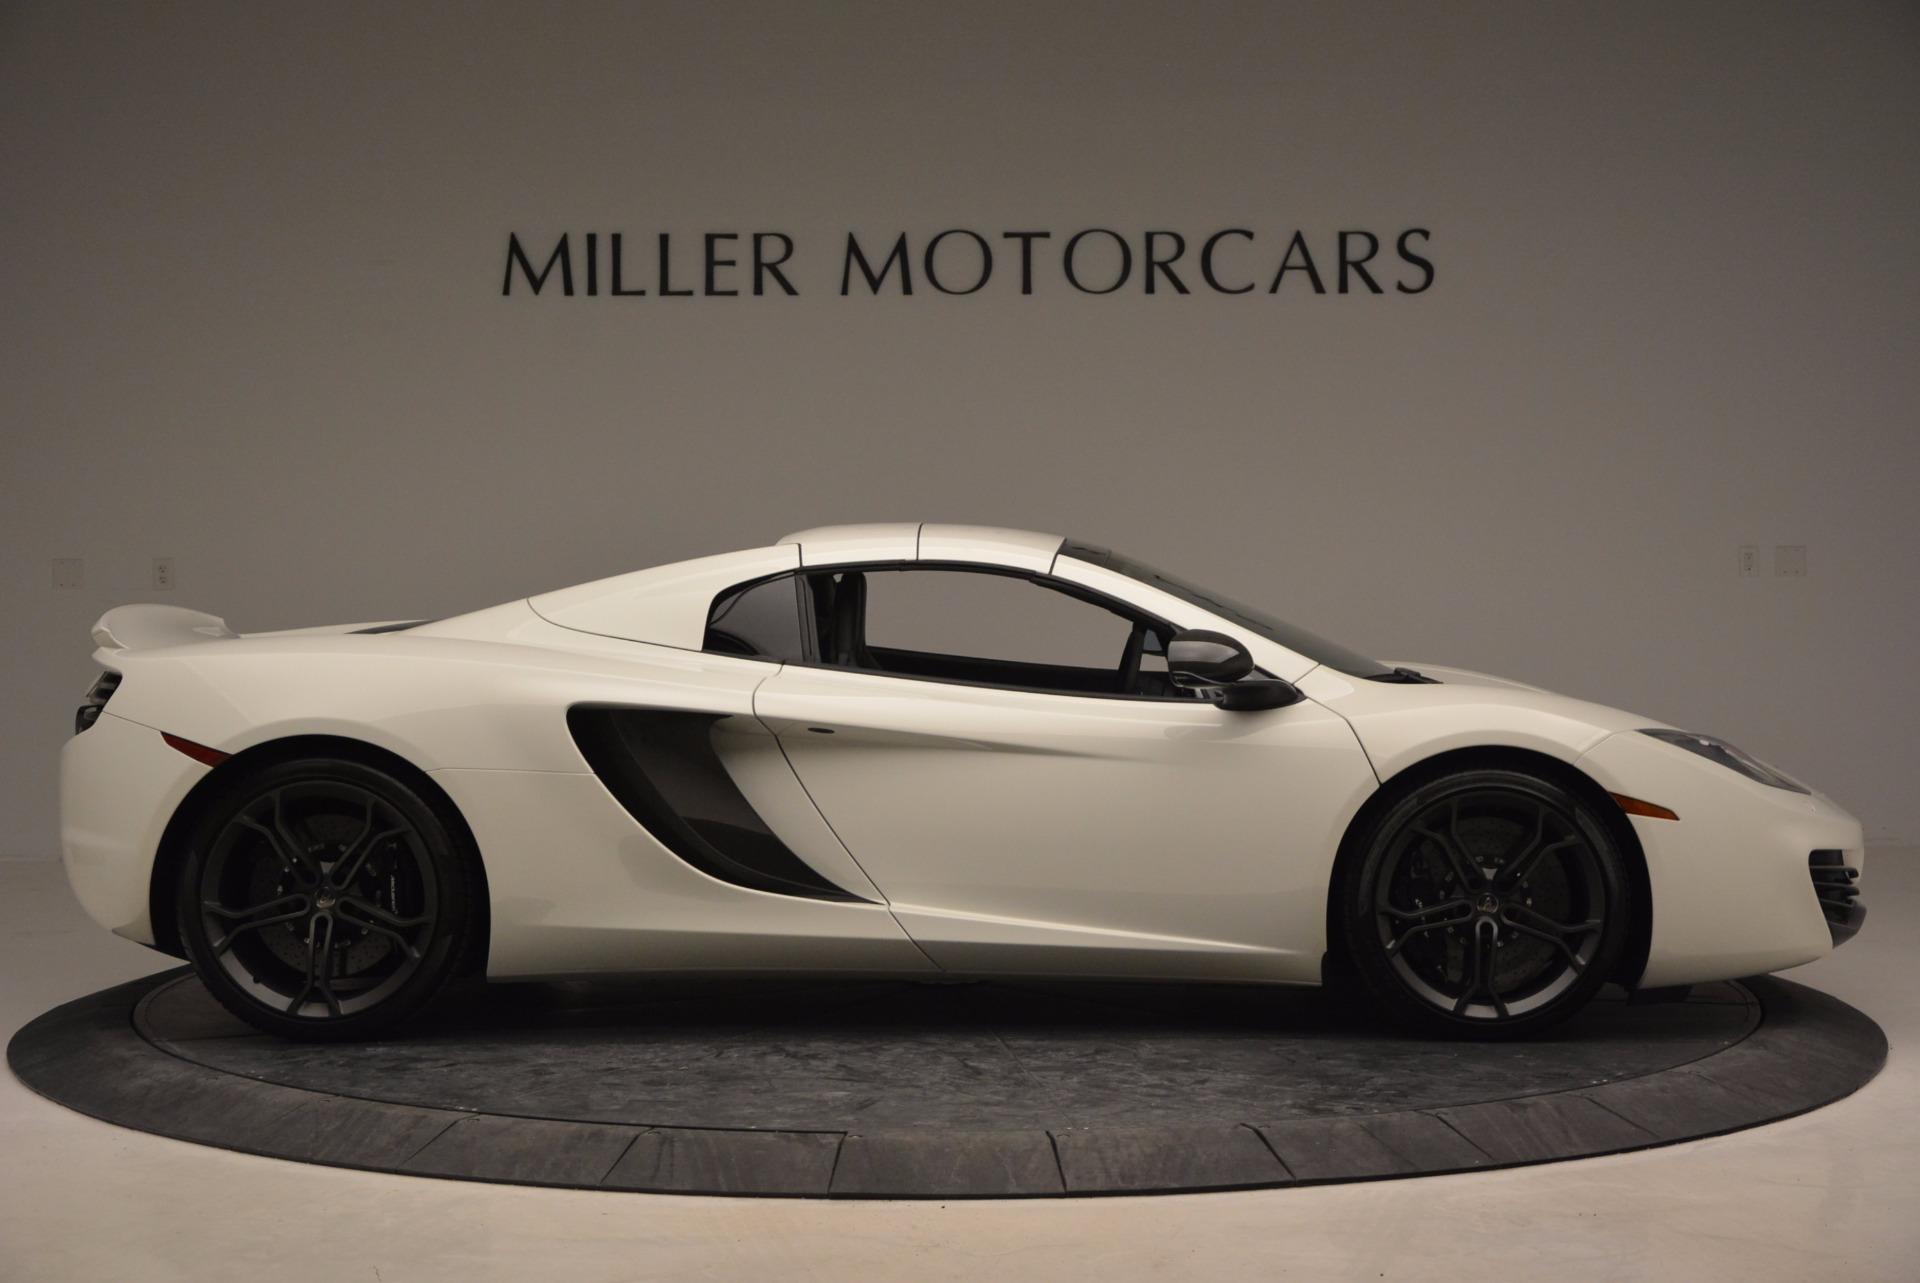 Used 2014 McLaren MP4-12C Spider For Sale In Greenwich, CT. Alfa Romeo of Greenwich, 3136 908_p19